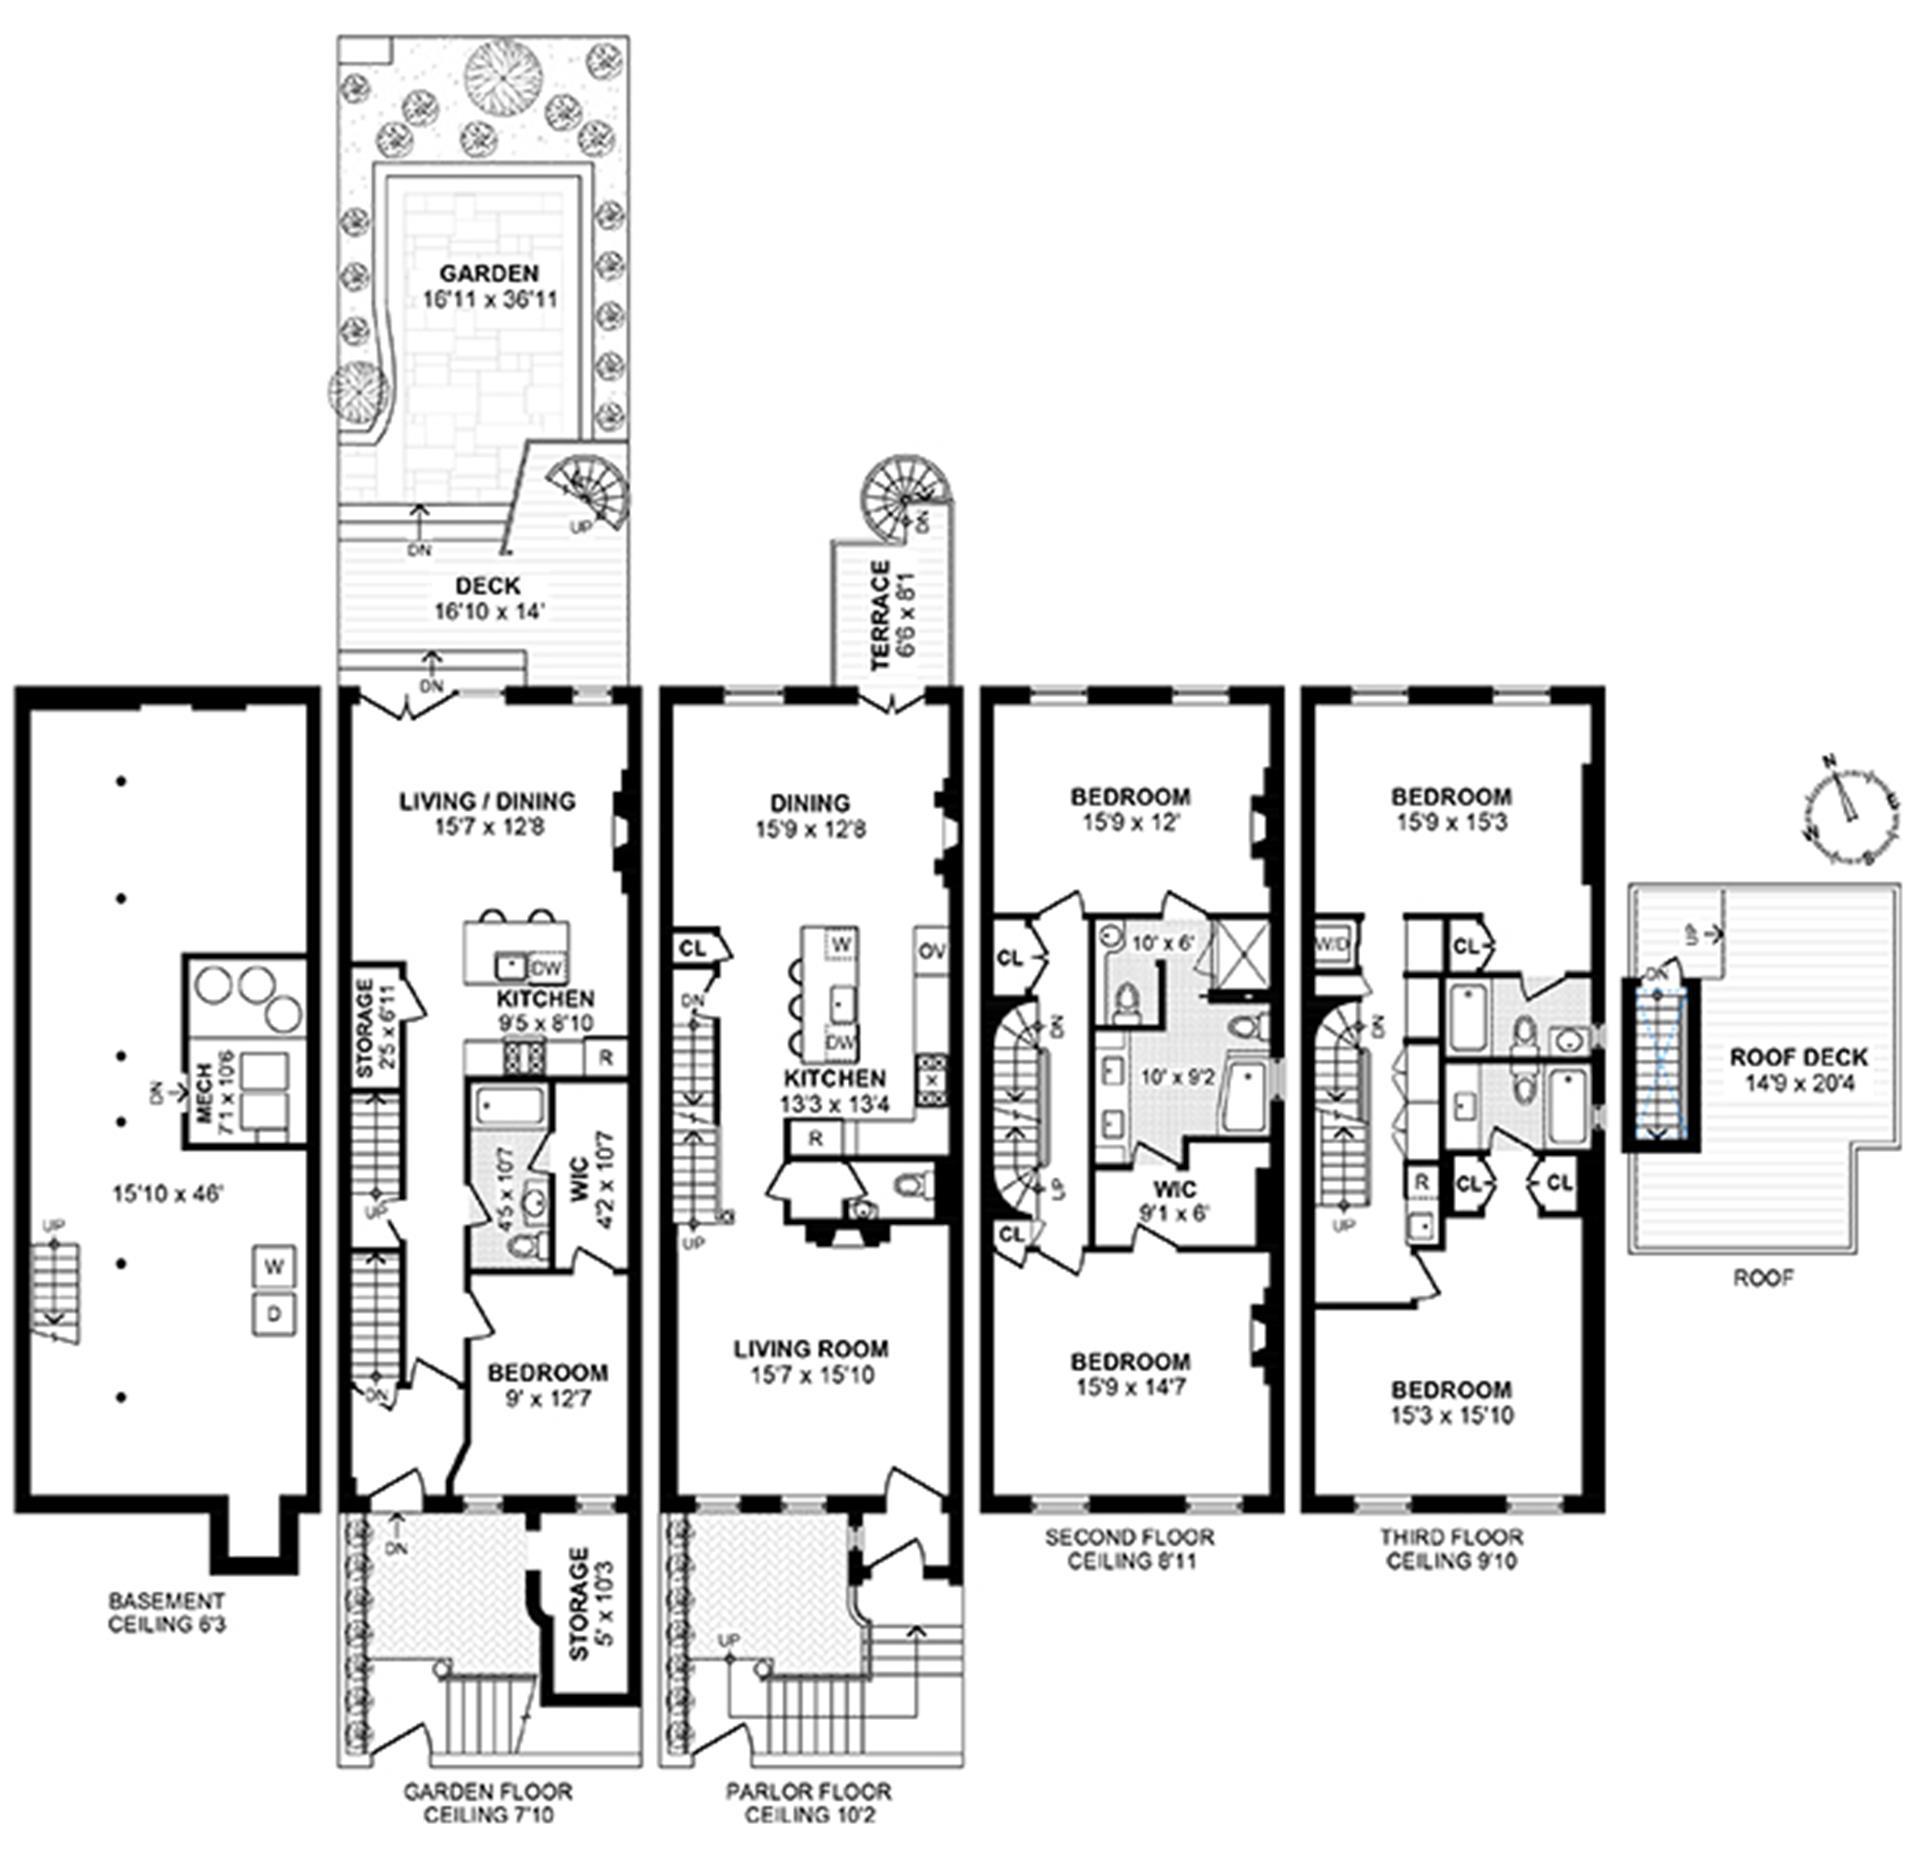 Floor plan of 333 East 65th Street - Upper East Side, New York